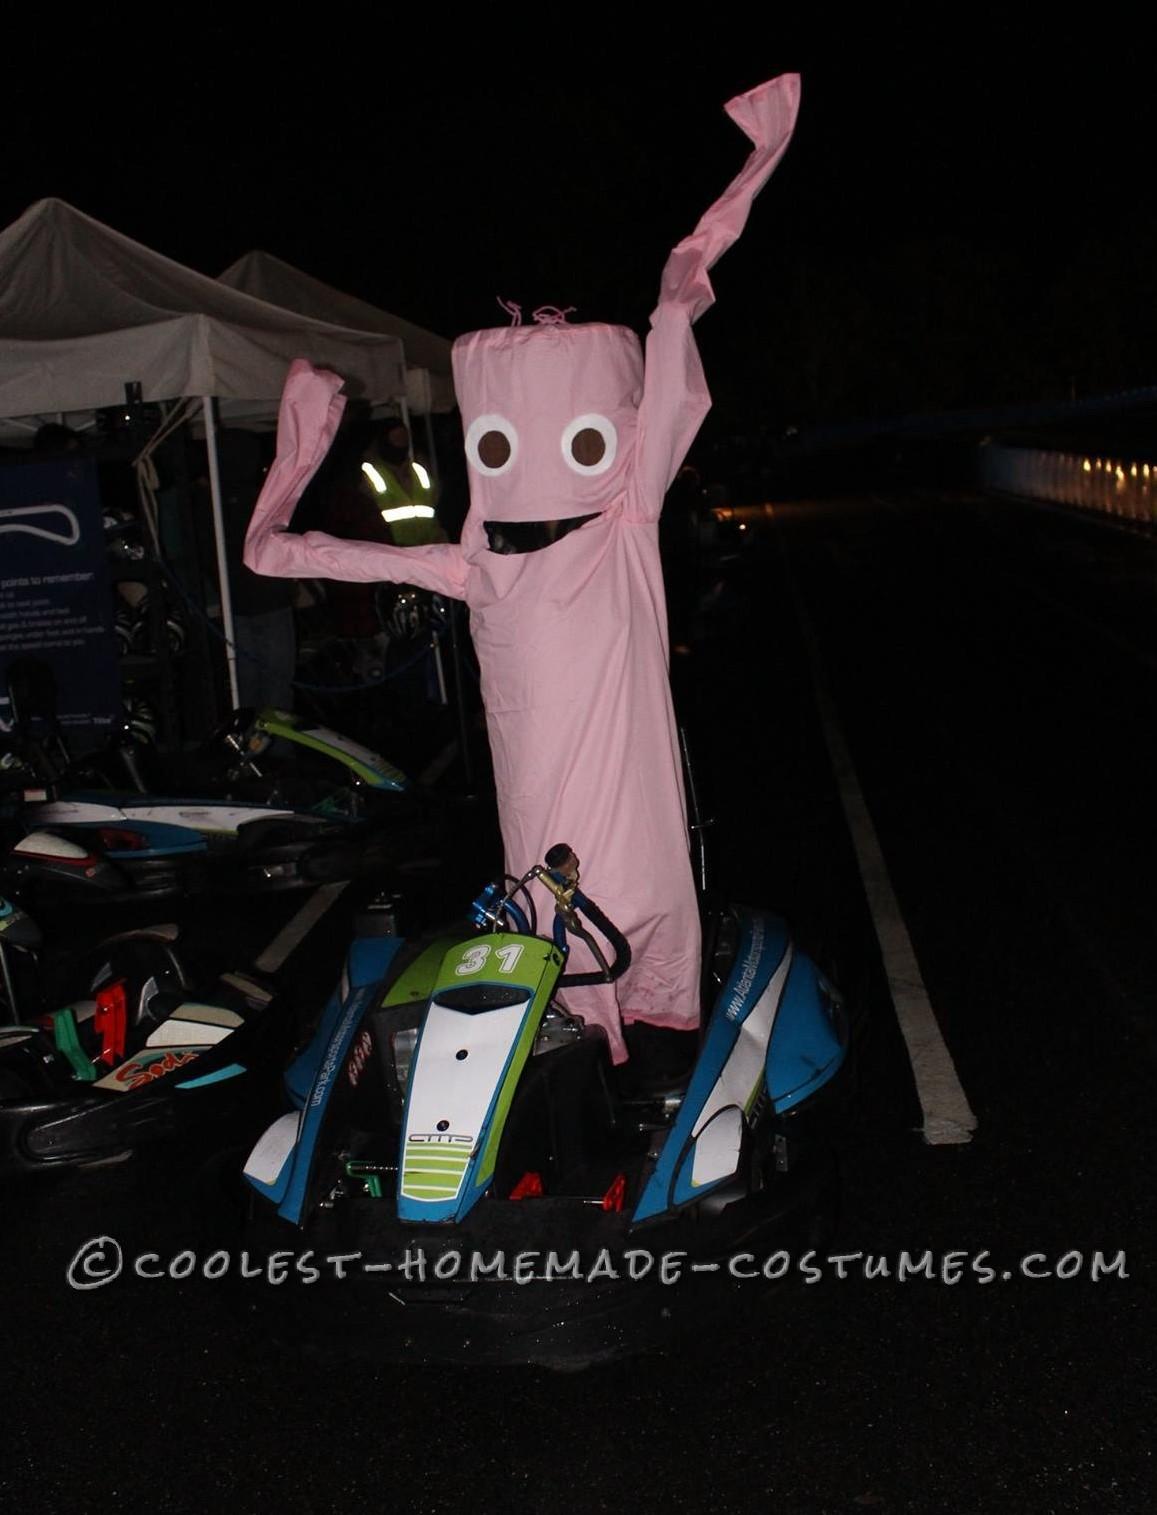 Wacky Wavy Inflatable Tube Man/Woman Costume